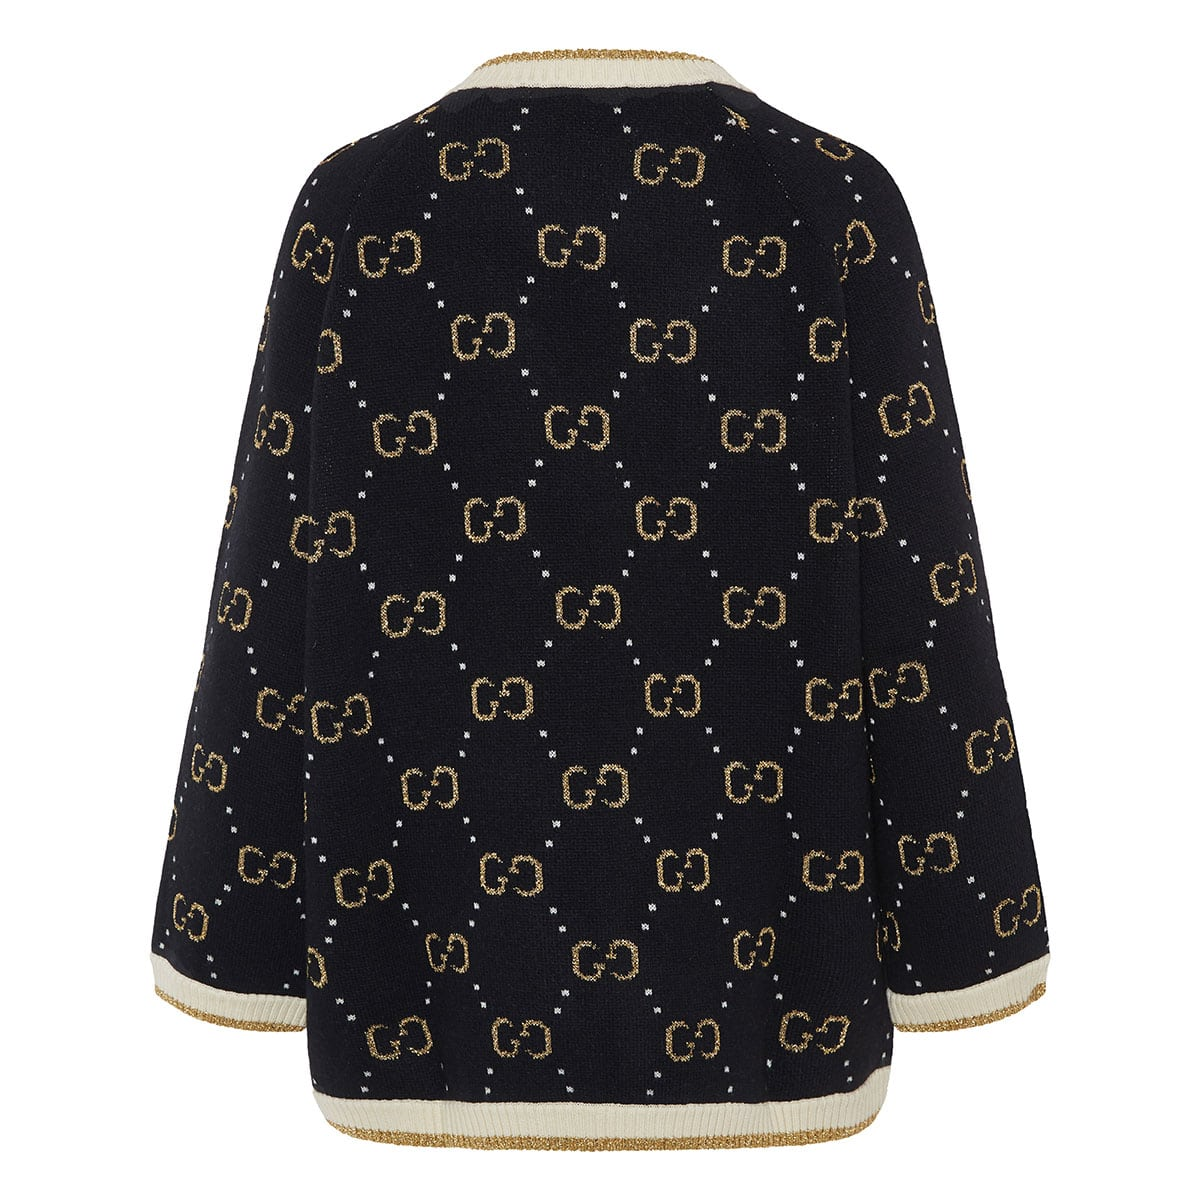 GG jacquard knitted cardigan